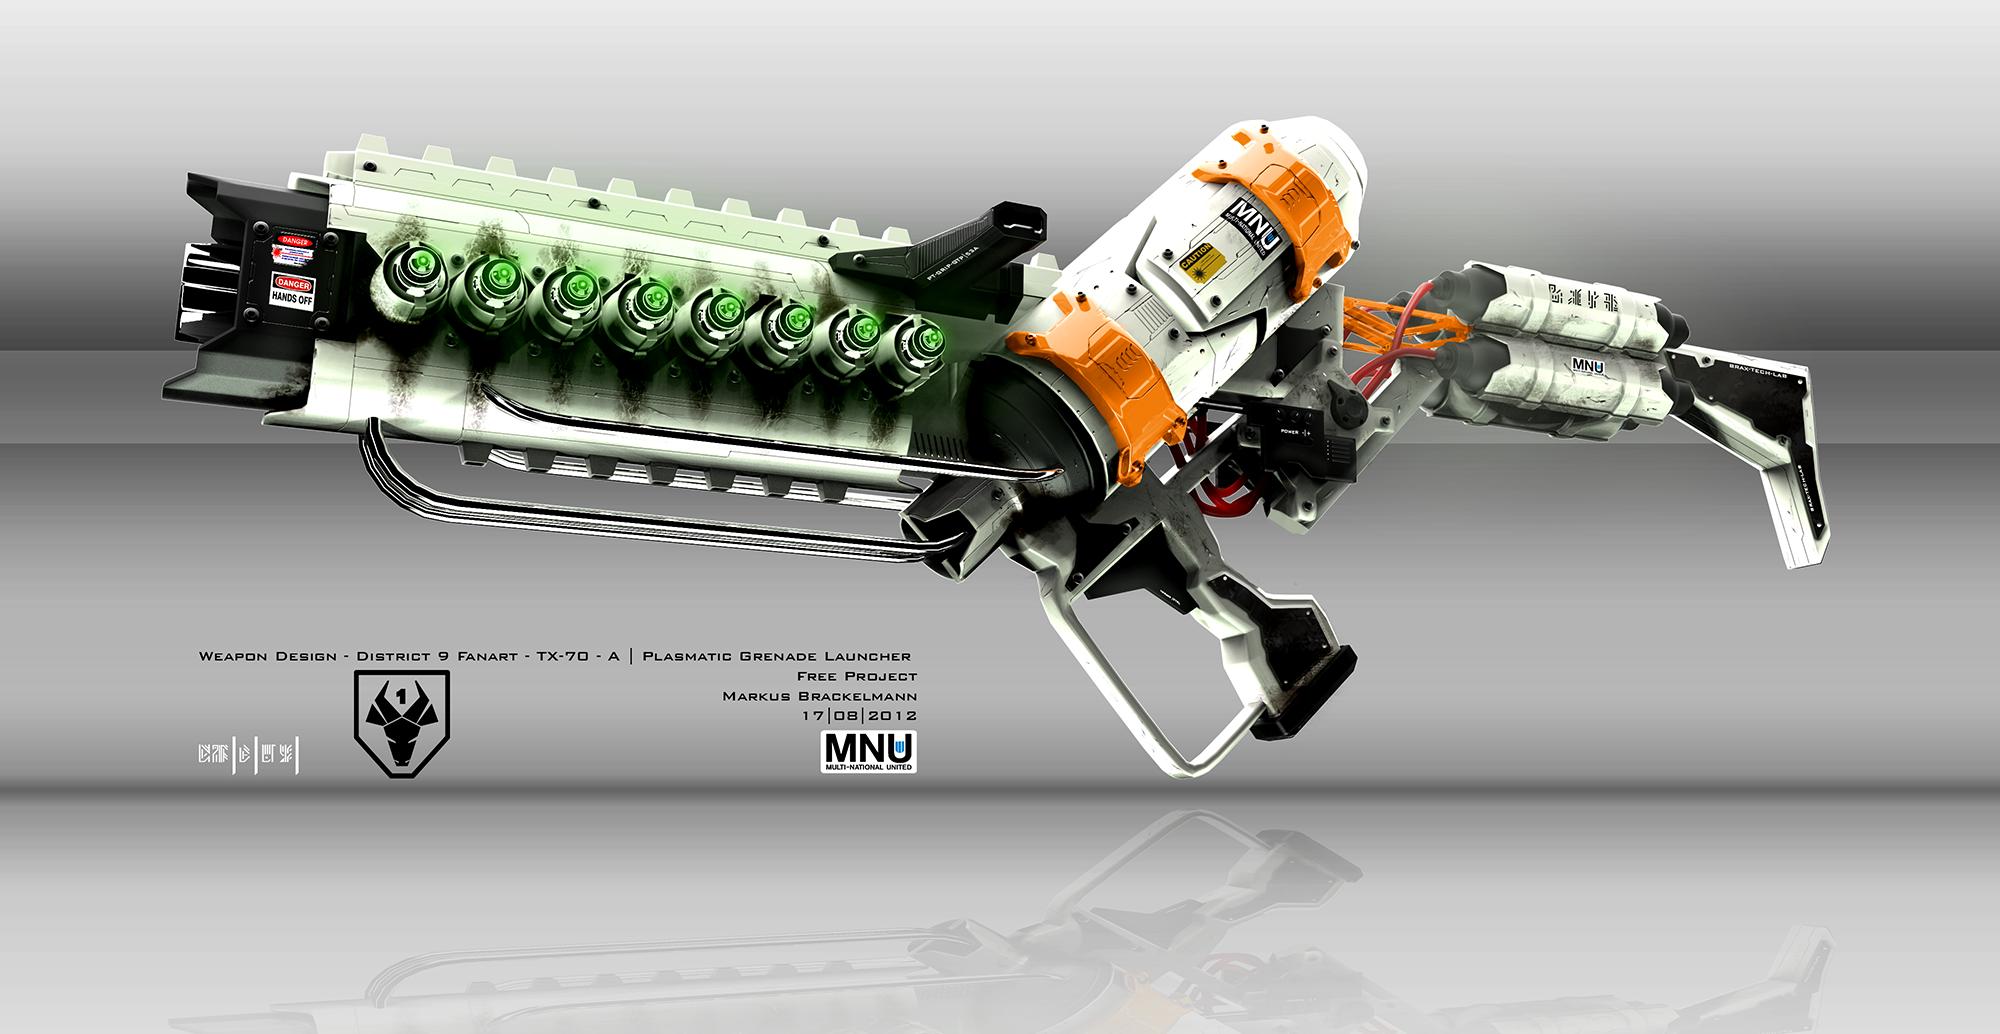 Concept Art of a District 9 Weapon by Braxxon on DeviantArt